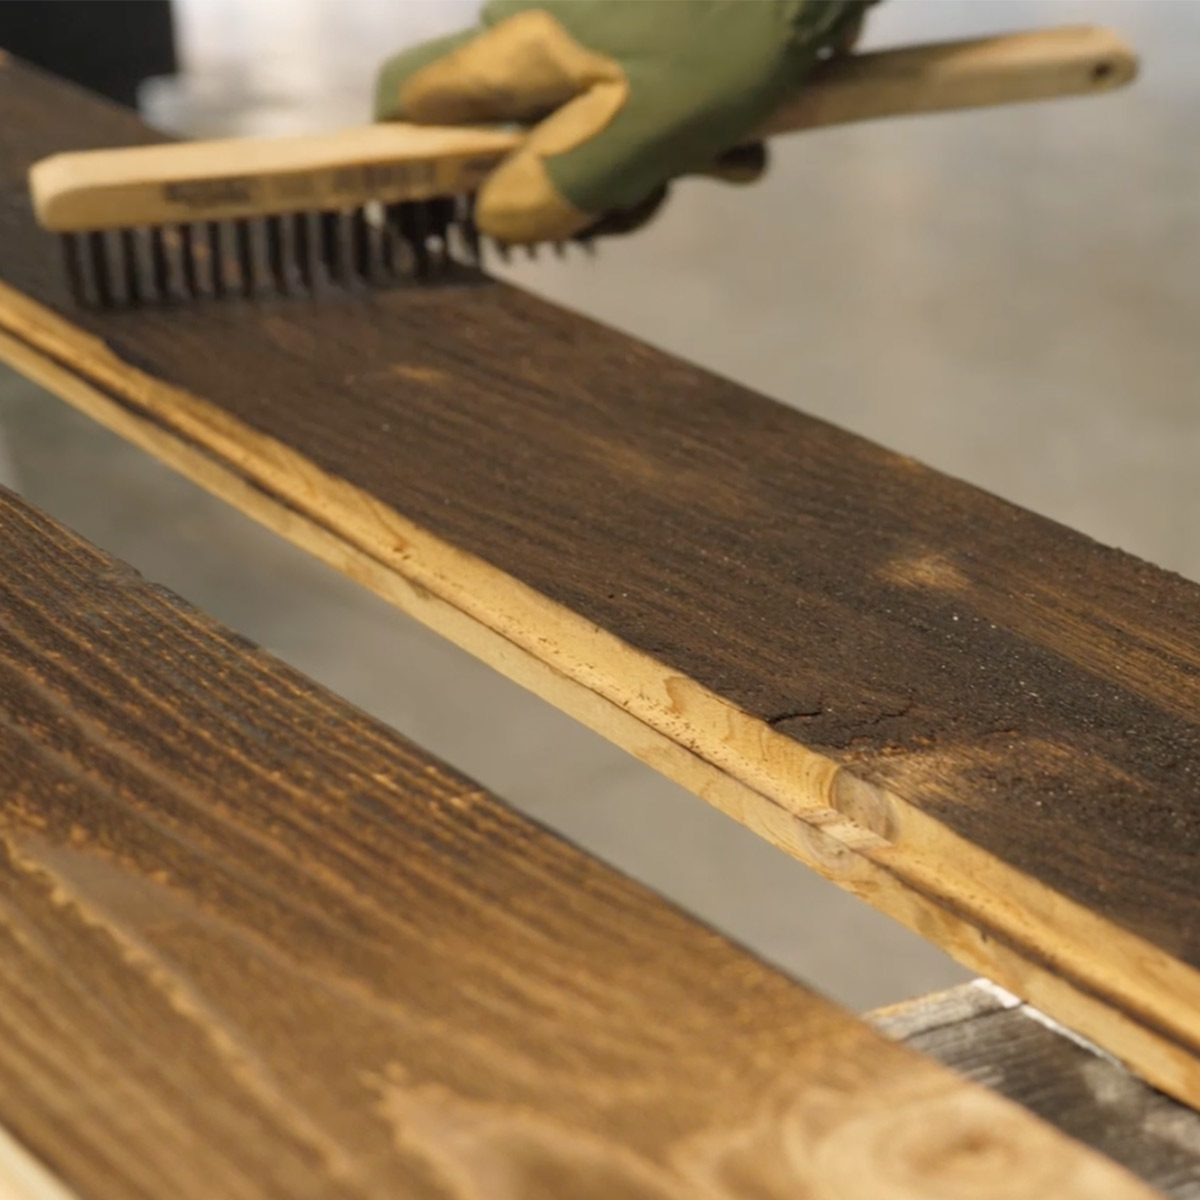 Shou Sugi Ban - finishing the wood